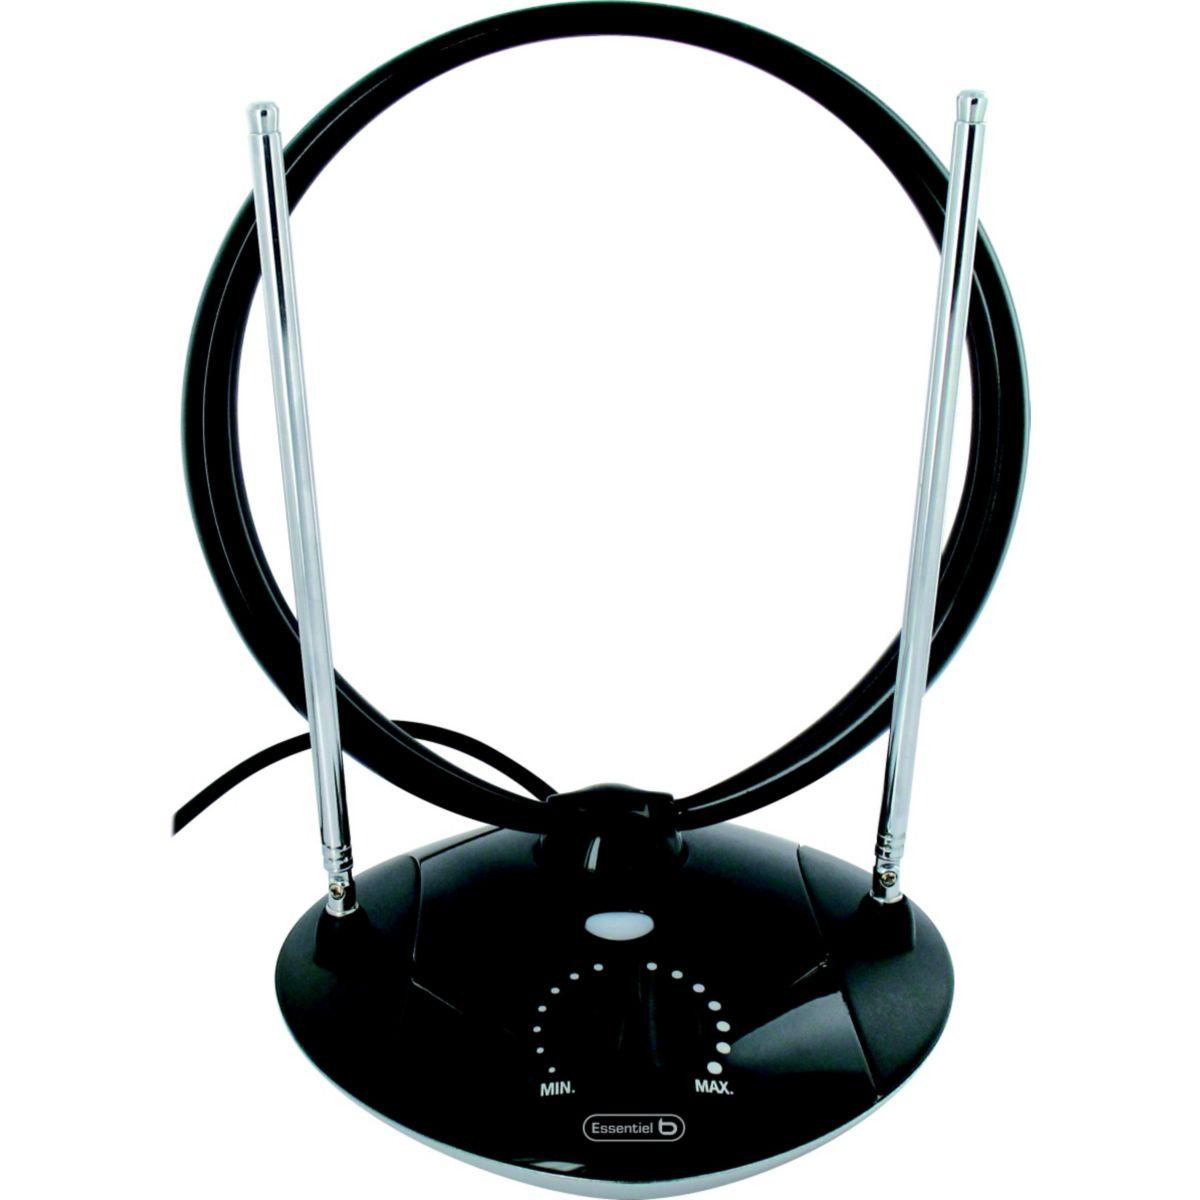 Antenne int�rieure sc aliz�e ii 4g - livraison offerte : code liv (photo)